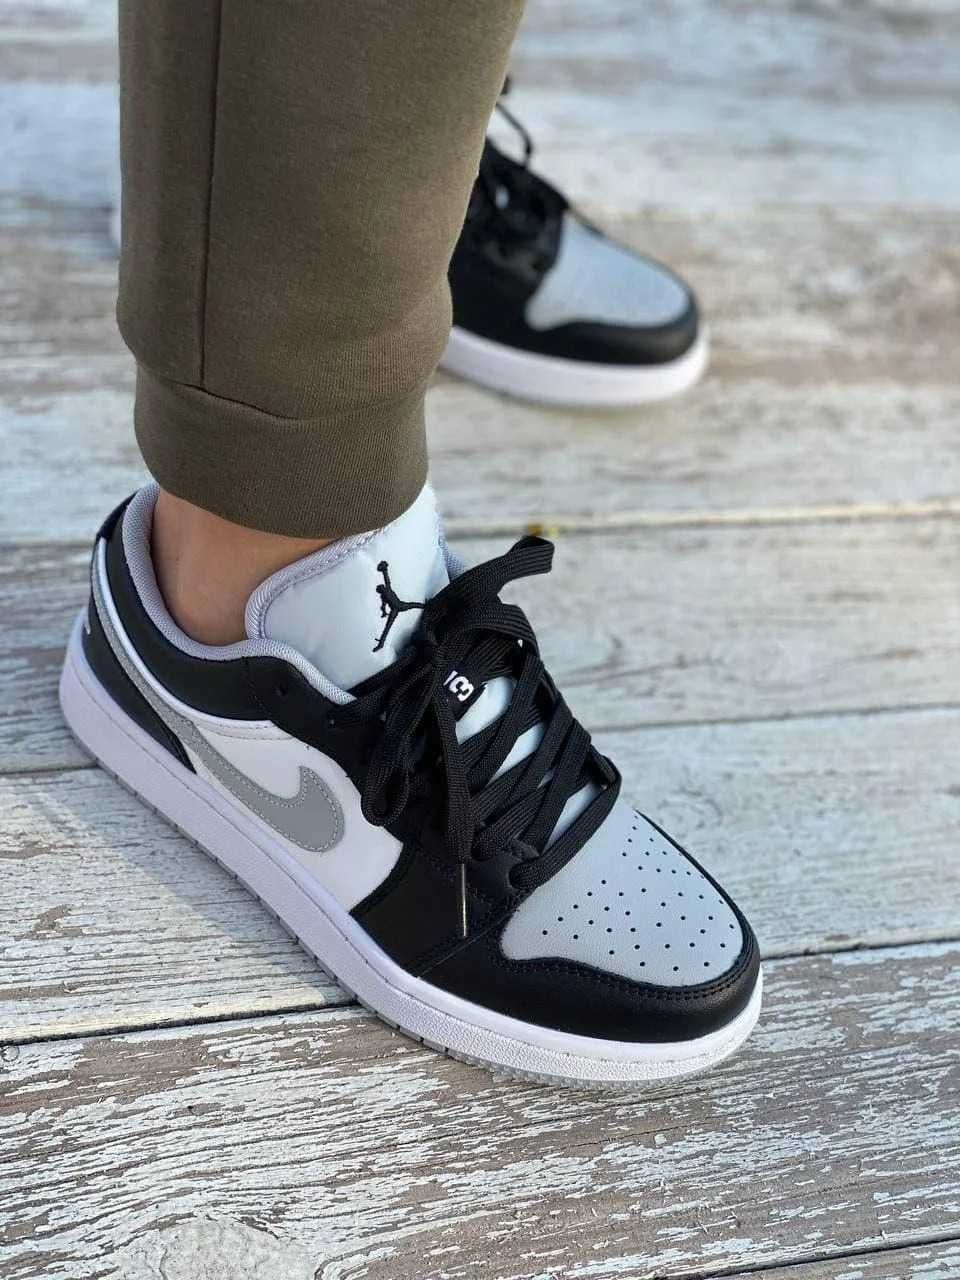 Кроссовки Nike Air Jordan Low Gray/Black/Force 1/Качество 1в1 Оригинал